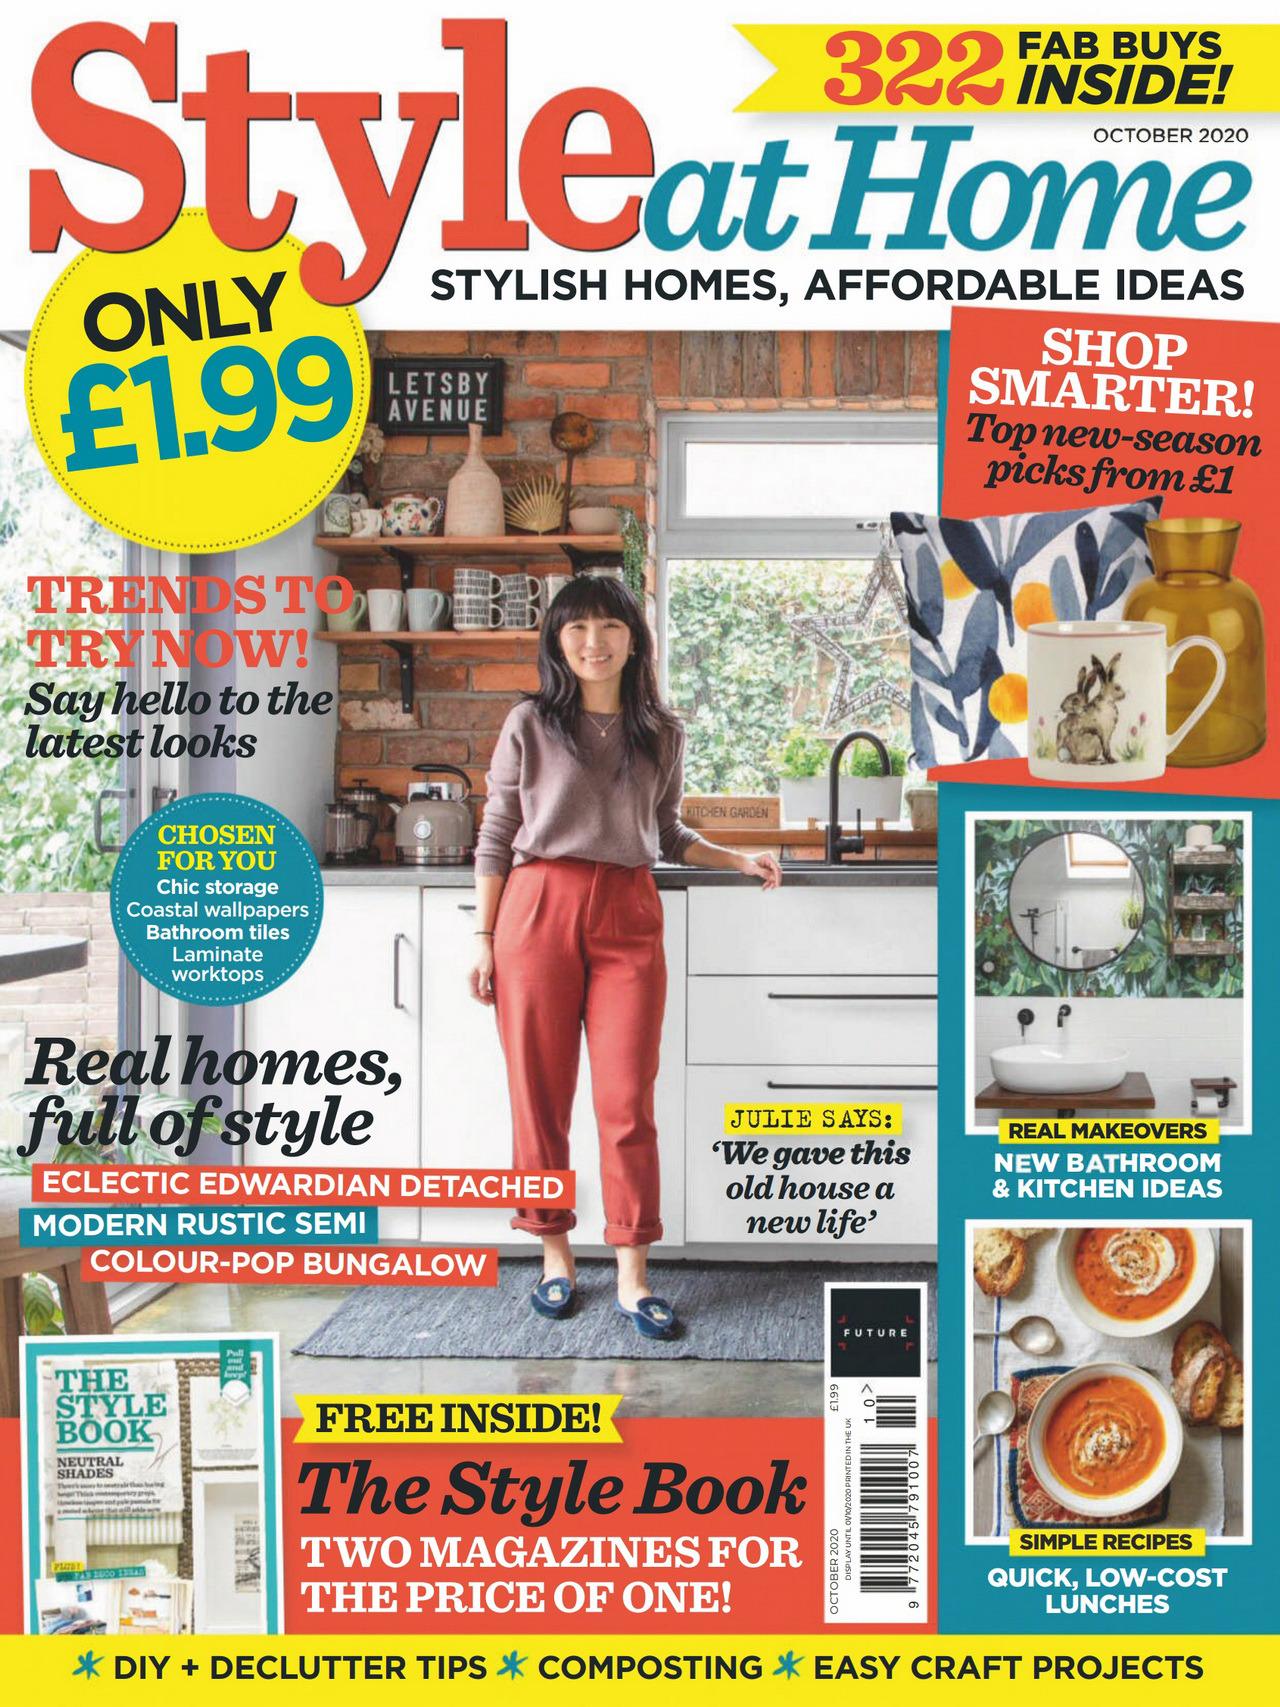 《Style at Home》英国版时尚家居杂志2020年10月号